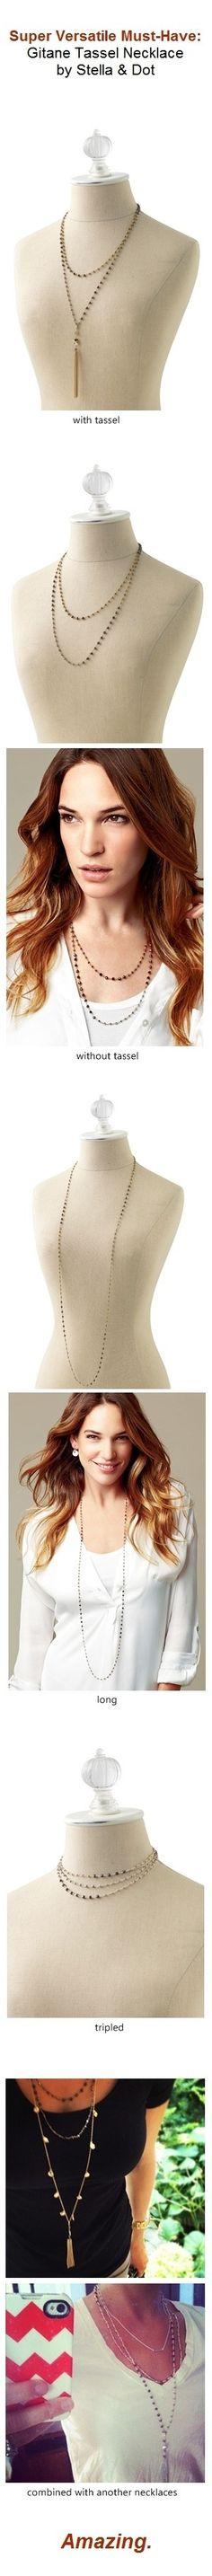 The Gitane Tassel Necklace  www.stelladot.com/angelynhorrell